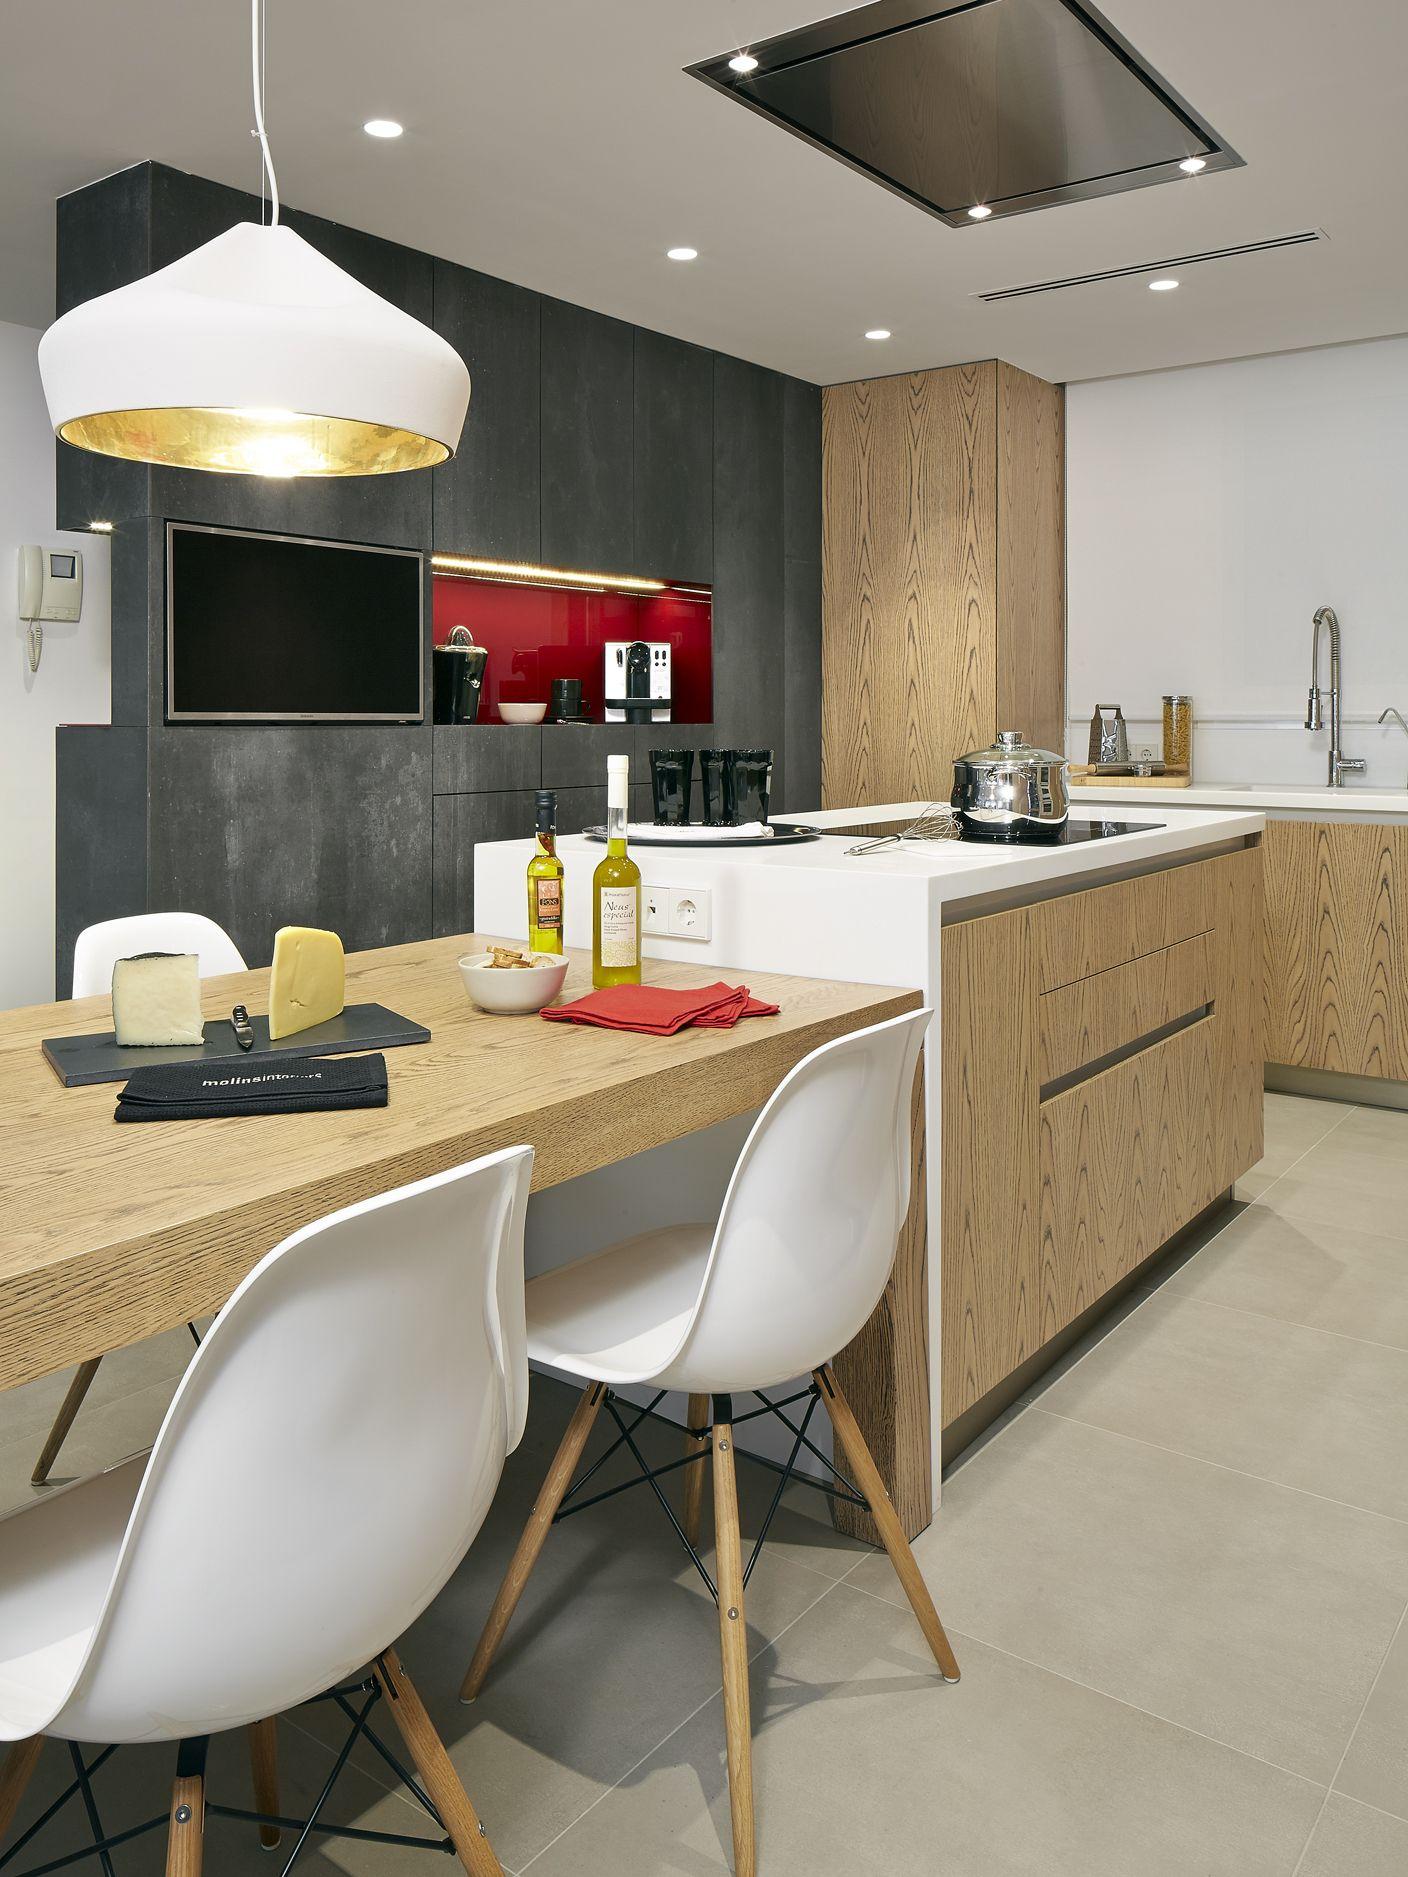 Molins interiors arquitectura interior cocina for Tipos de cocina arquitectura